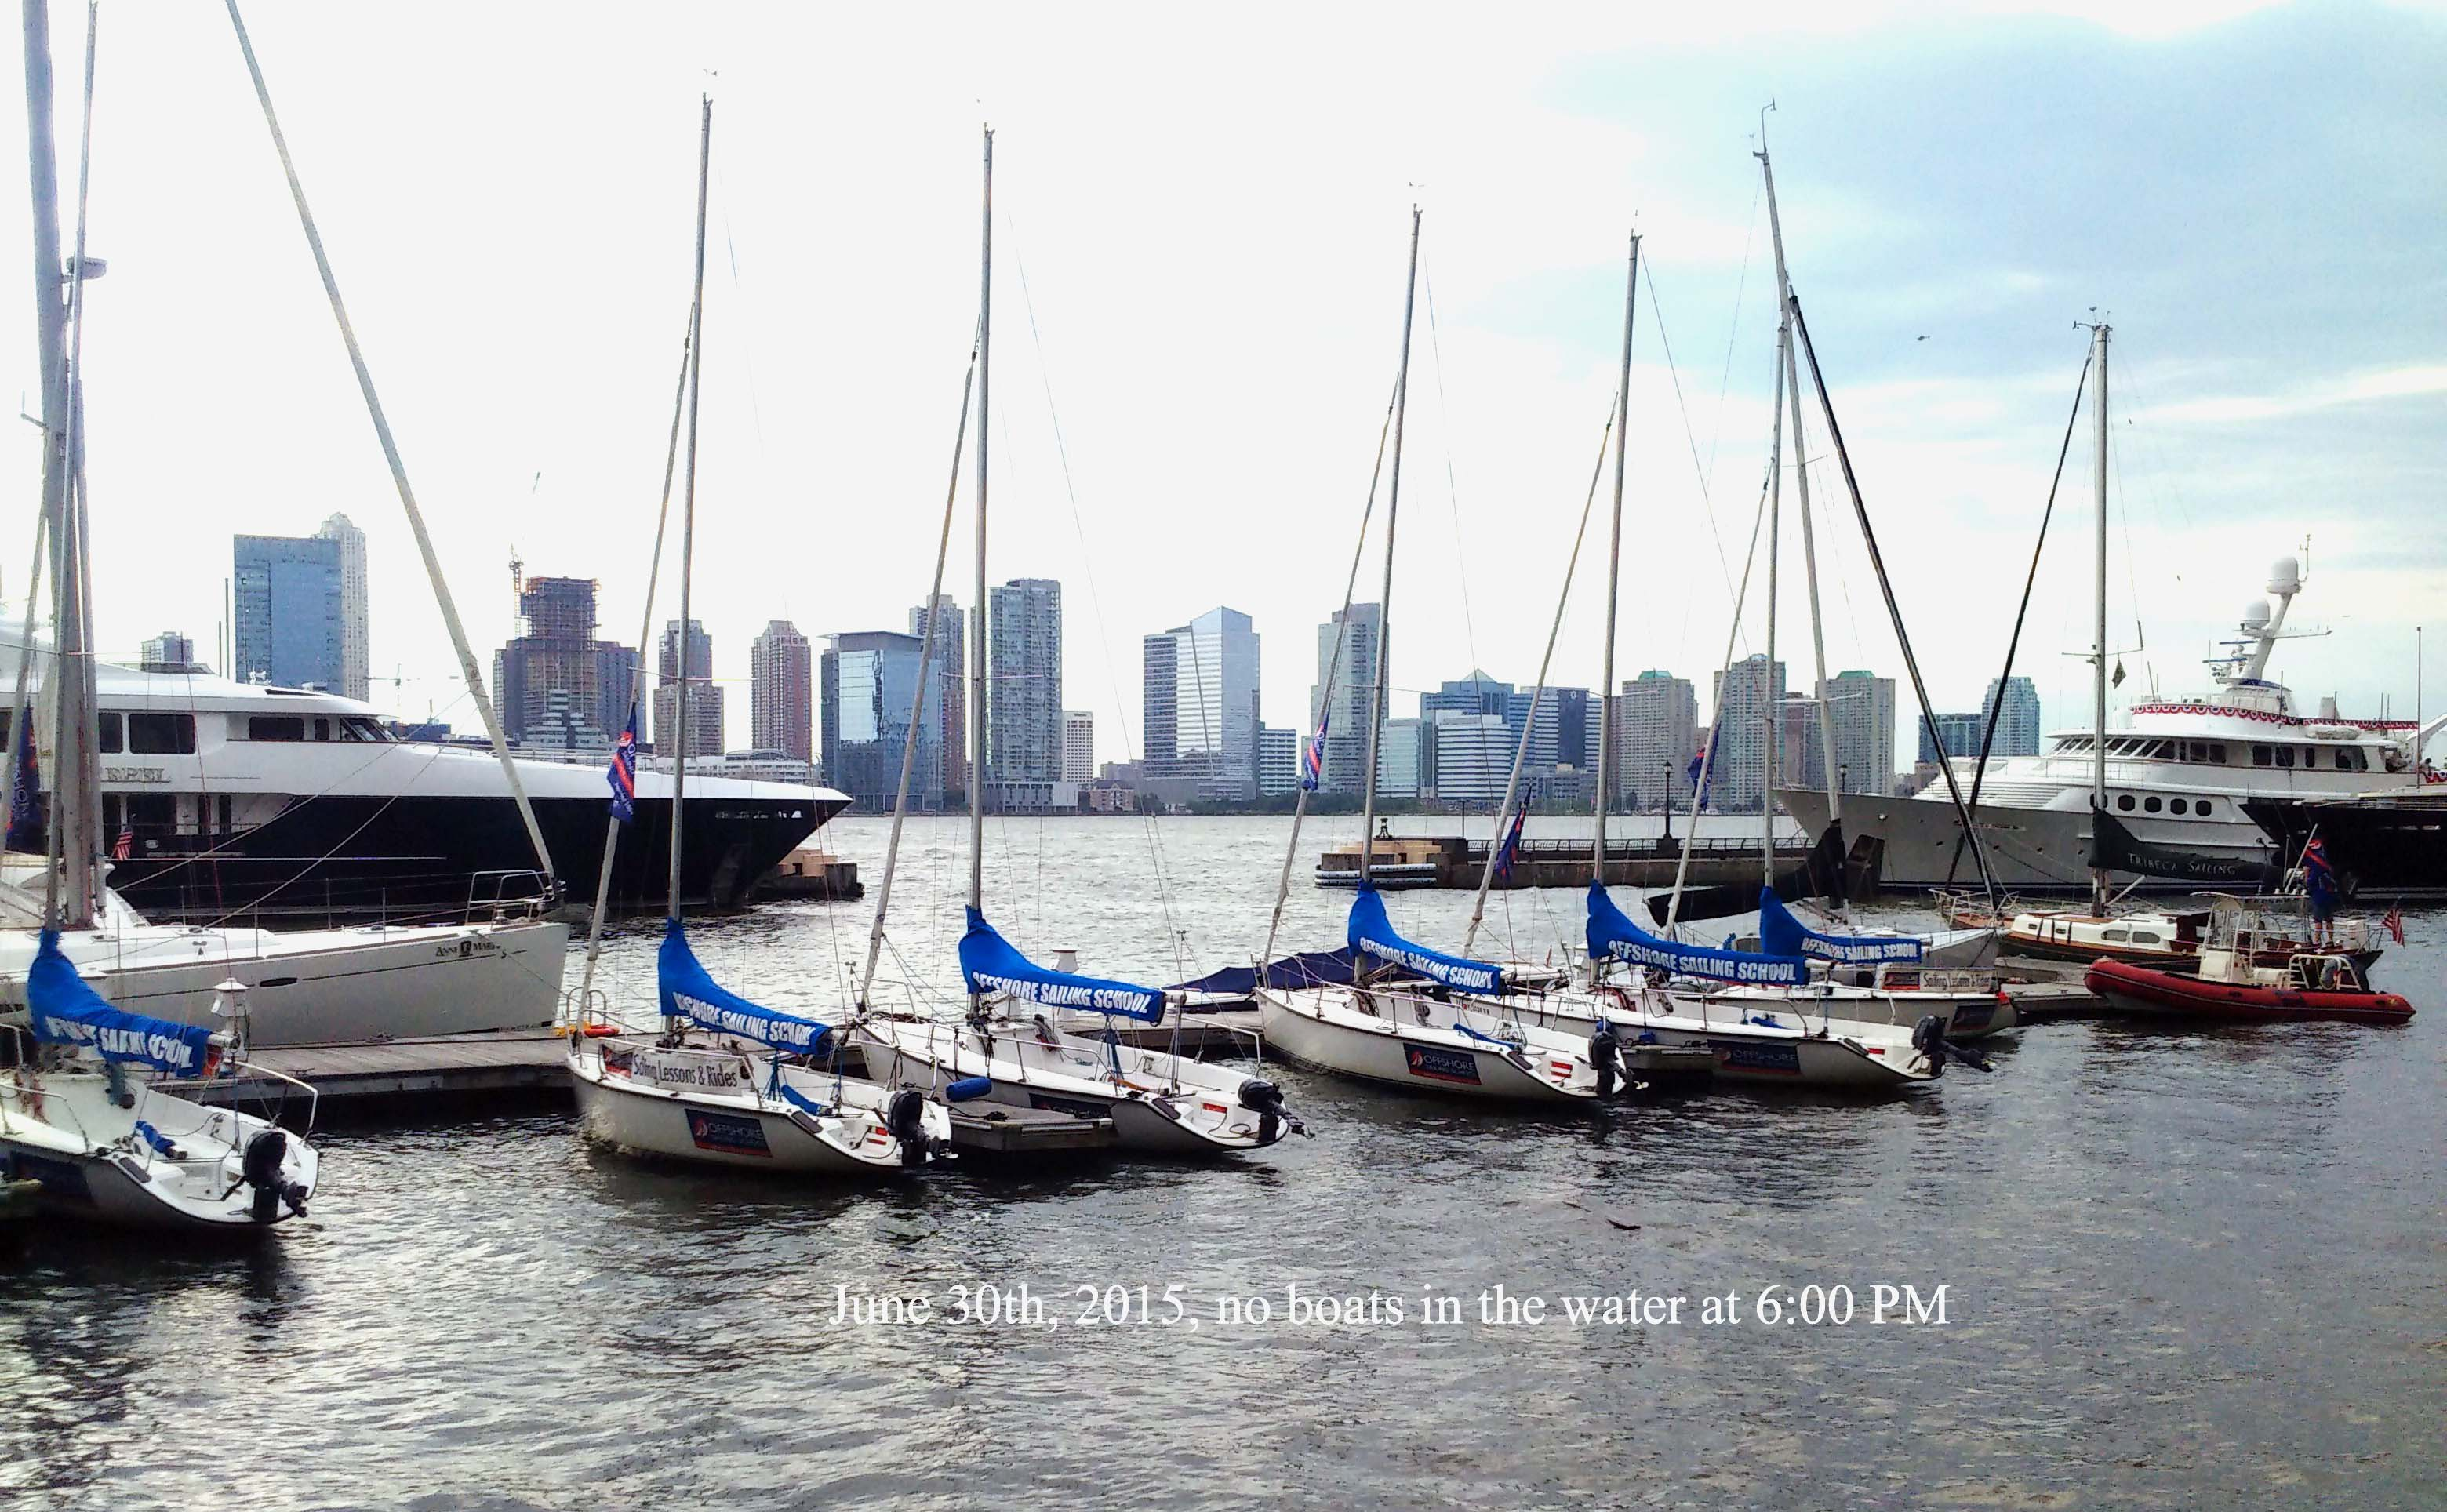 Offshore sailing school no activity